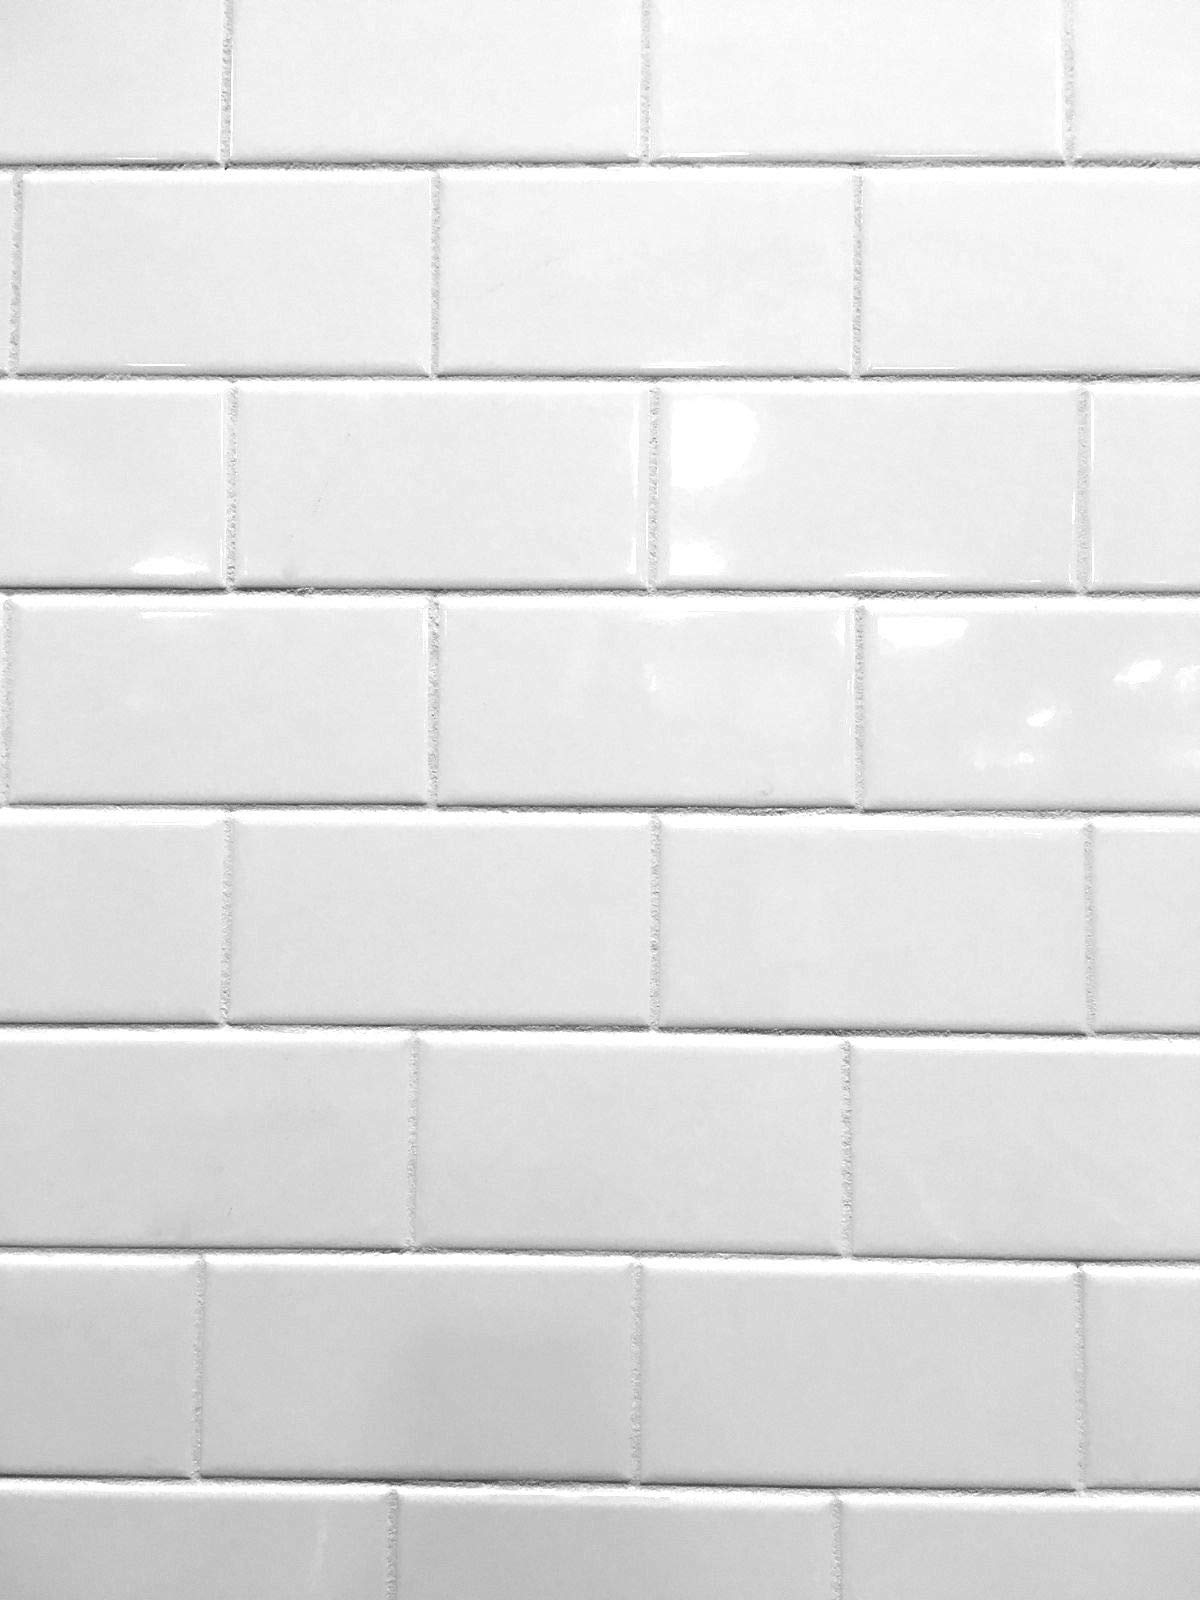 3x6 White Glossy Ceramic Subway Tile Wall Backsplash Made in USA (Full Box 100)